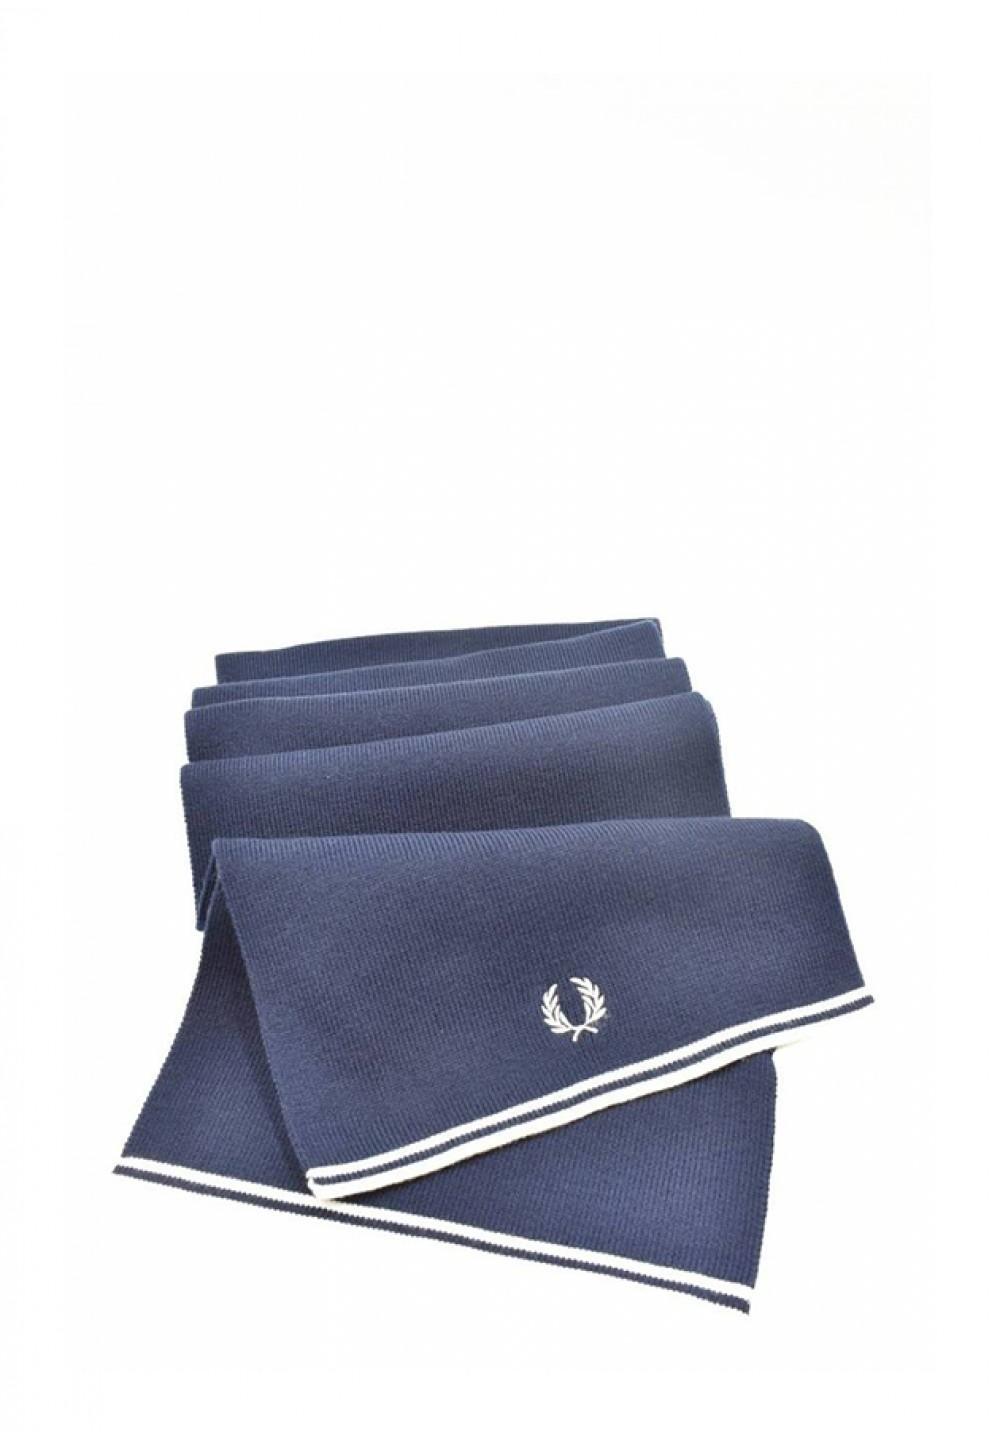 Темно-синий шарф с логотипом